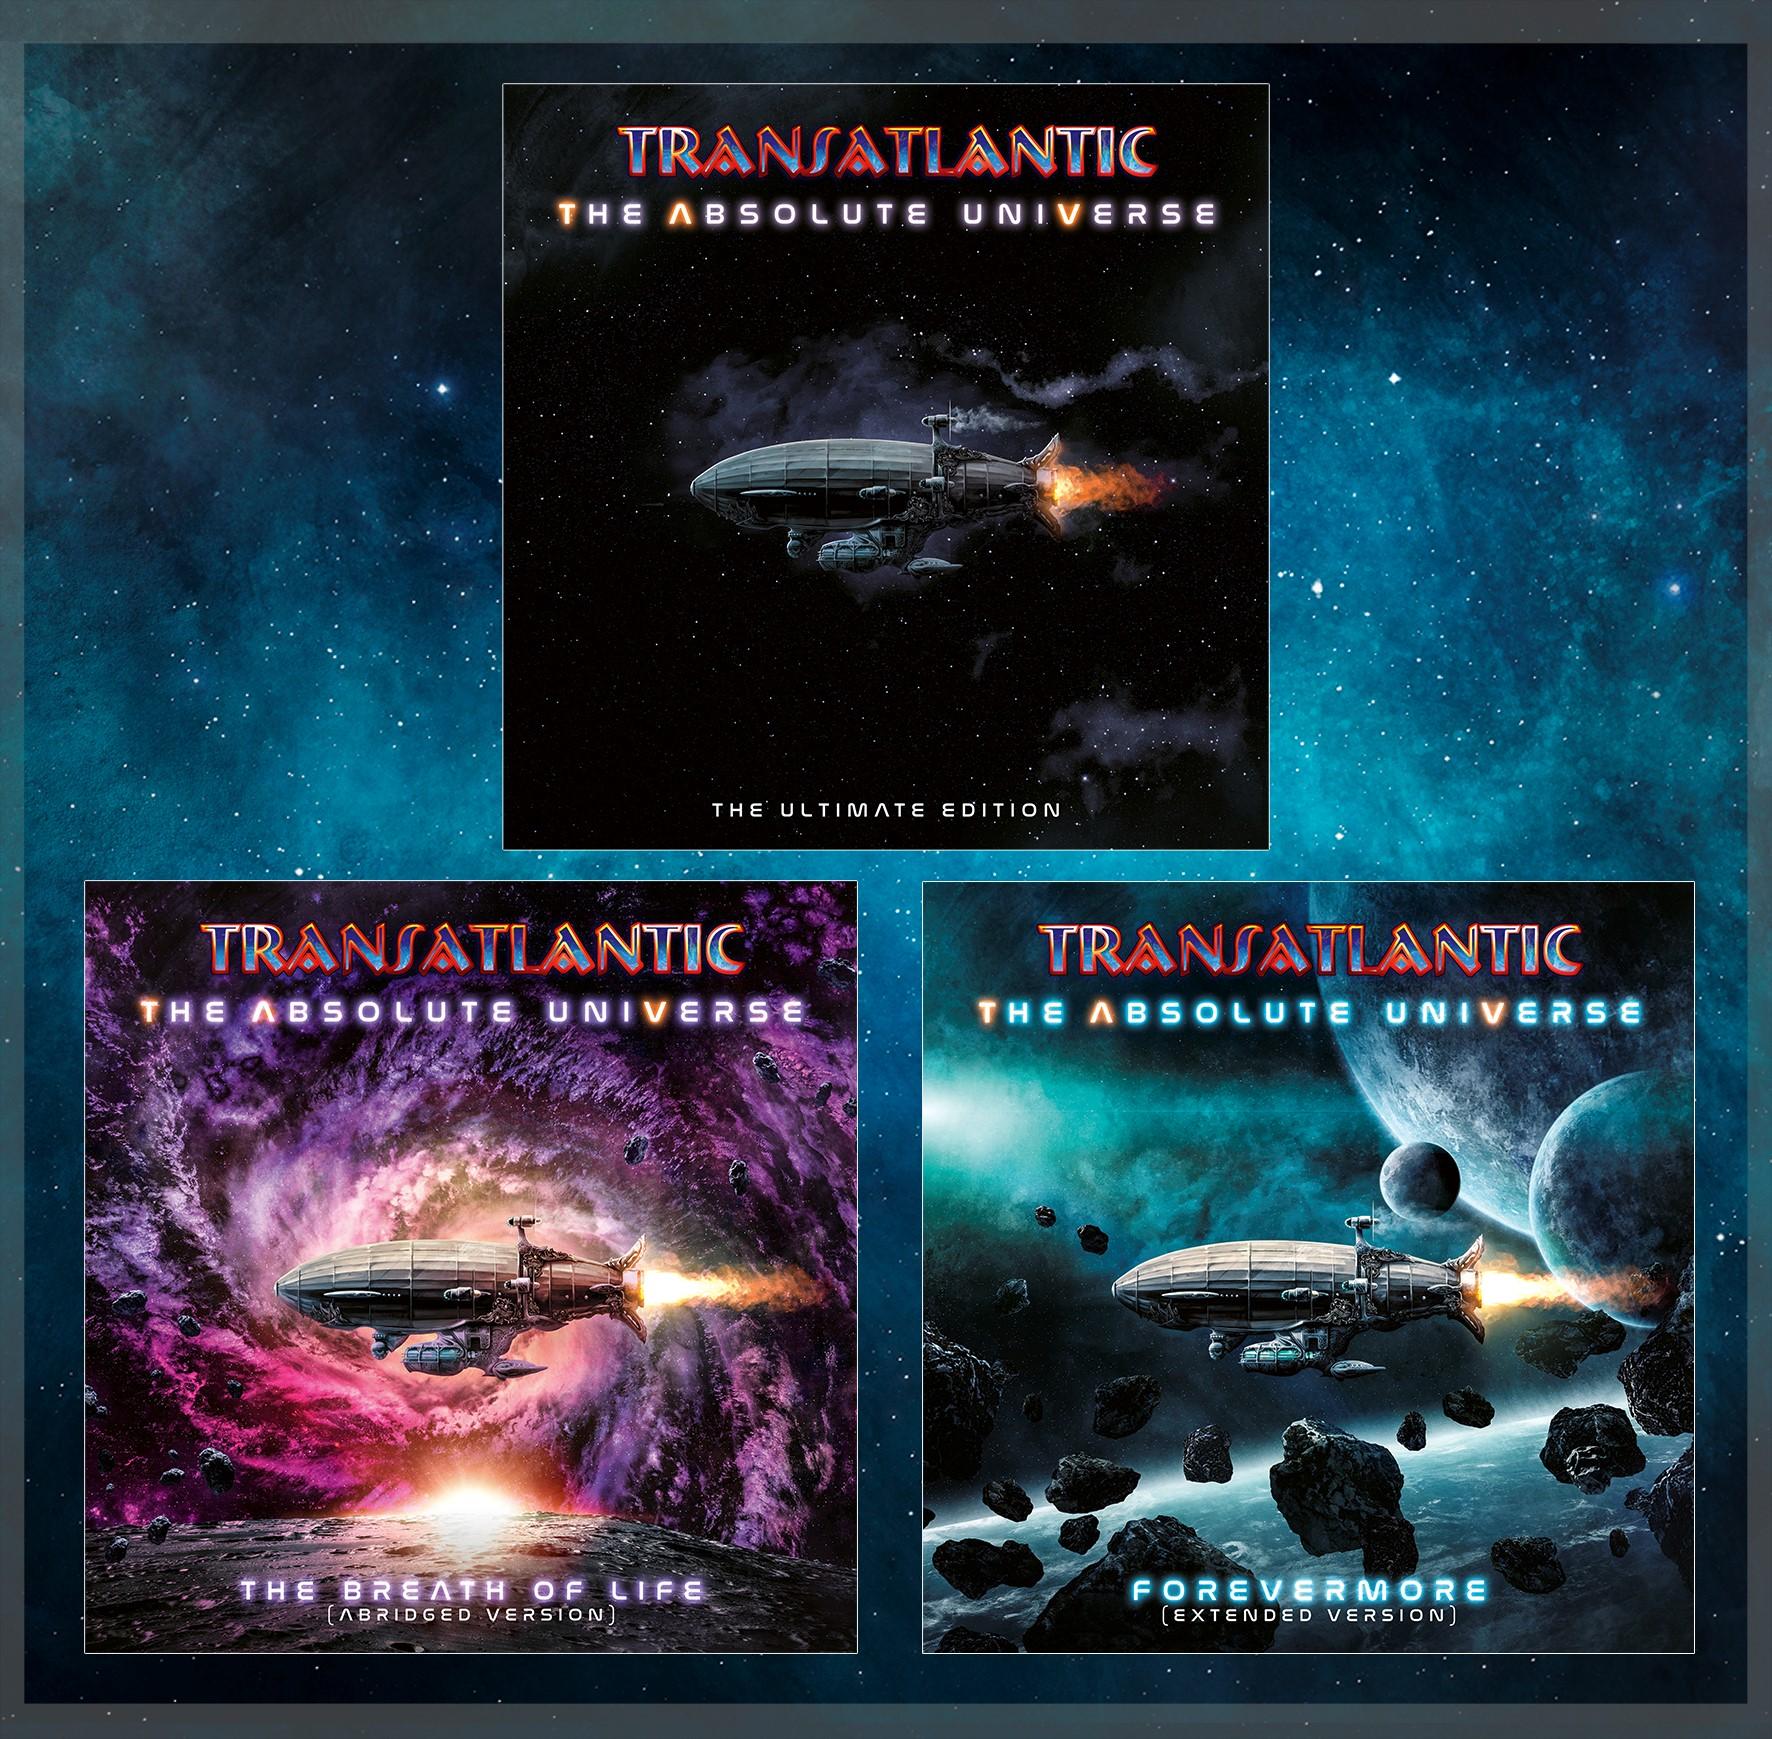 transatlantic-veroeffentlichen-video-overture-reaching-for-the-sky-erste-single-von-the-absolute-universe